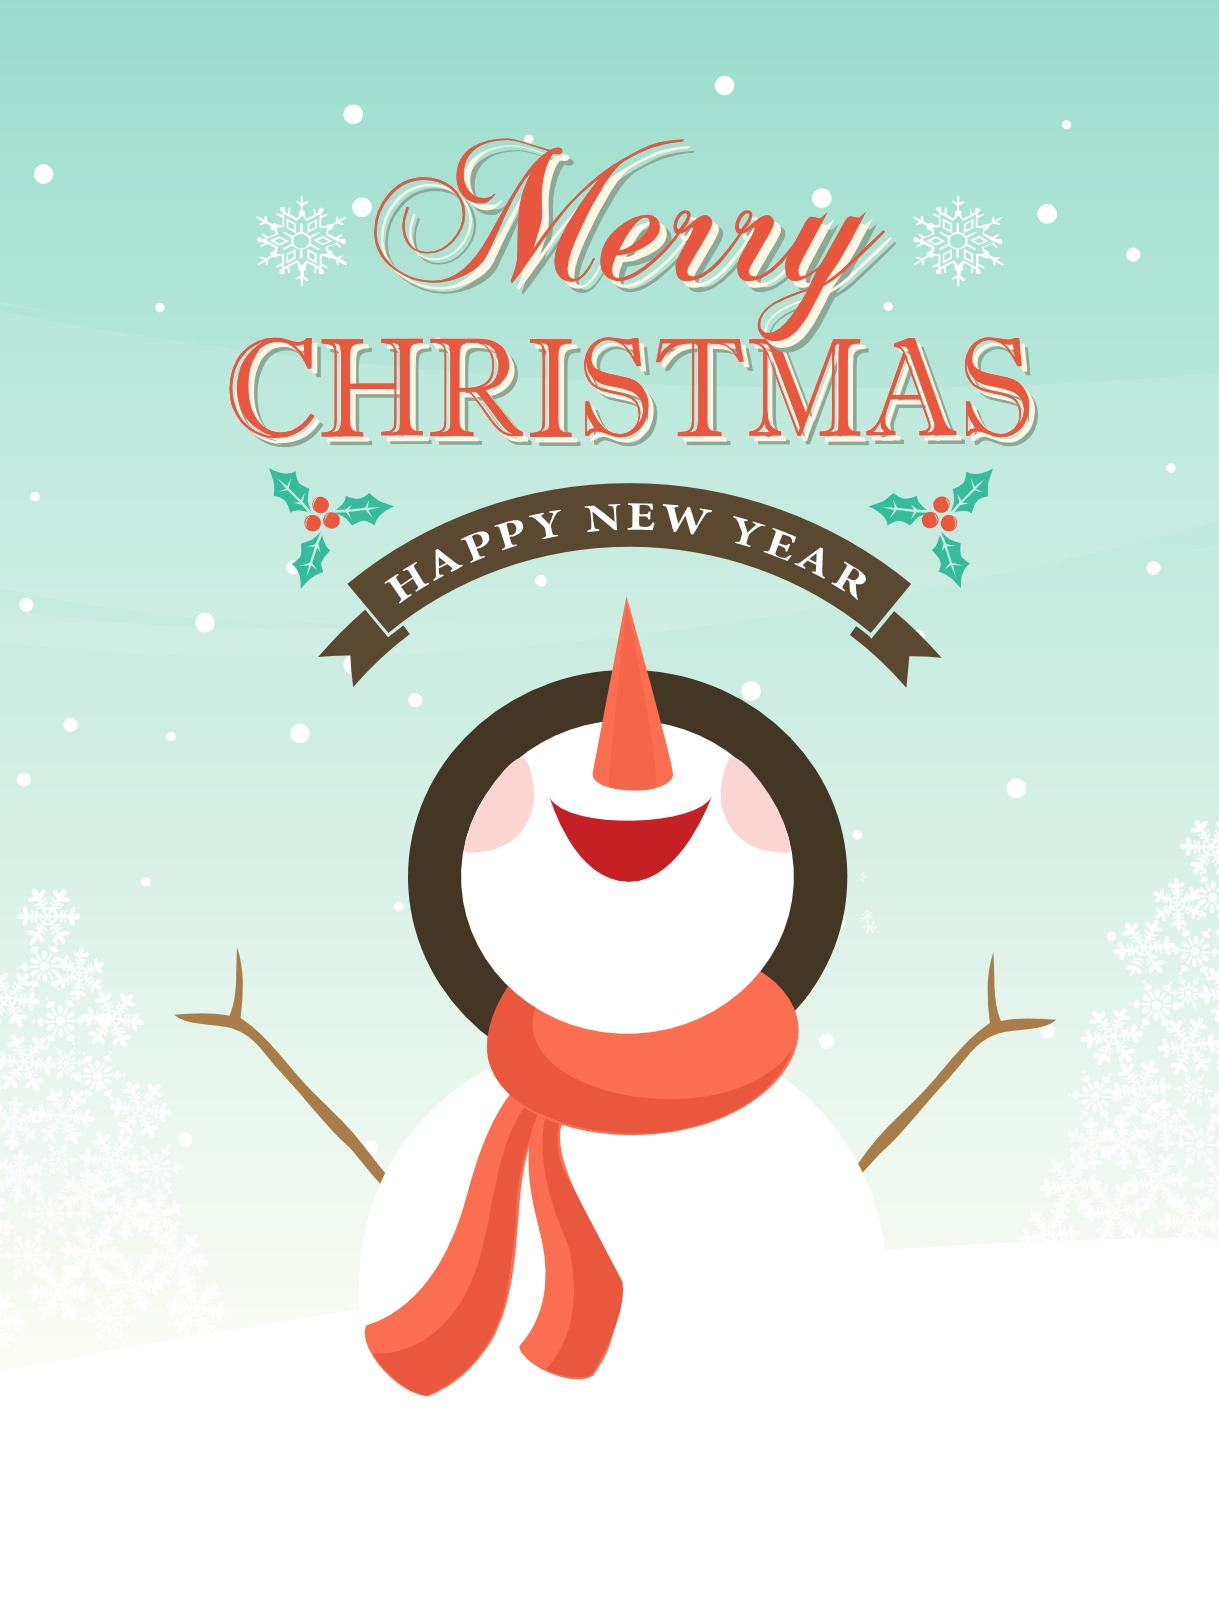 Cute Snowman Christmas Wallpaper Free Vector Snowman Christmas Background Download Free